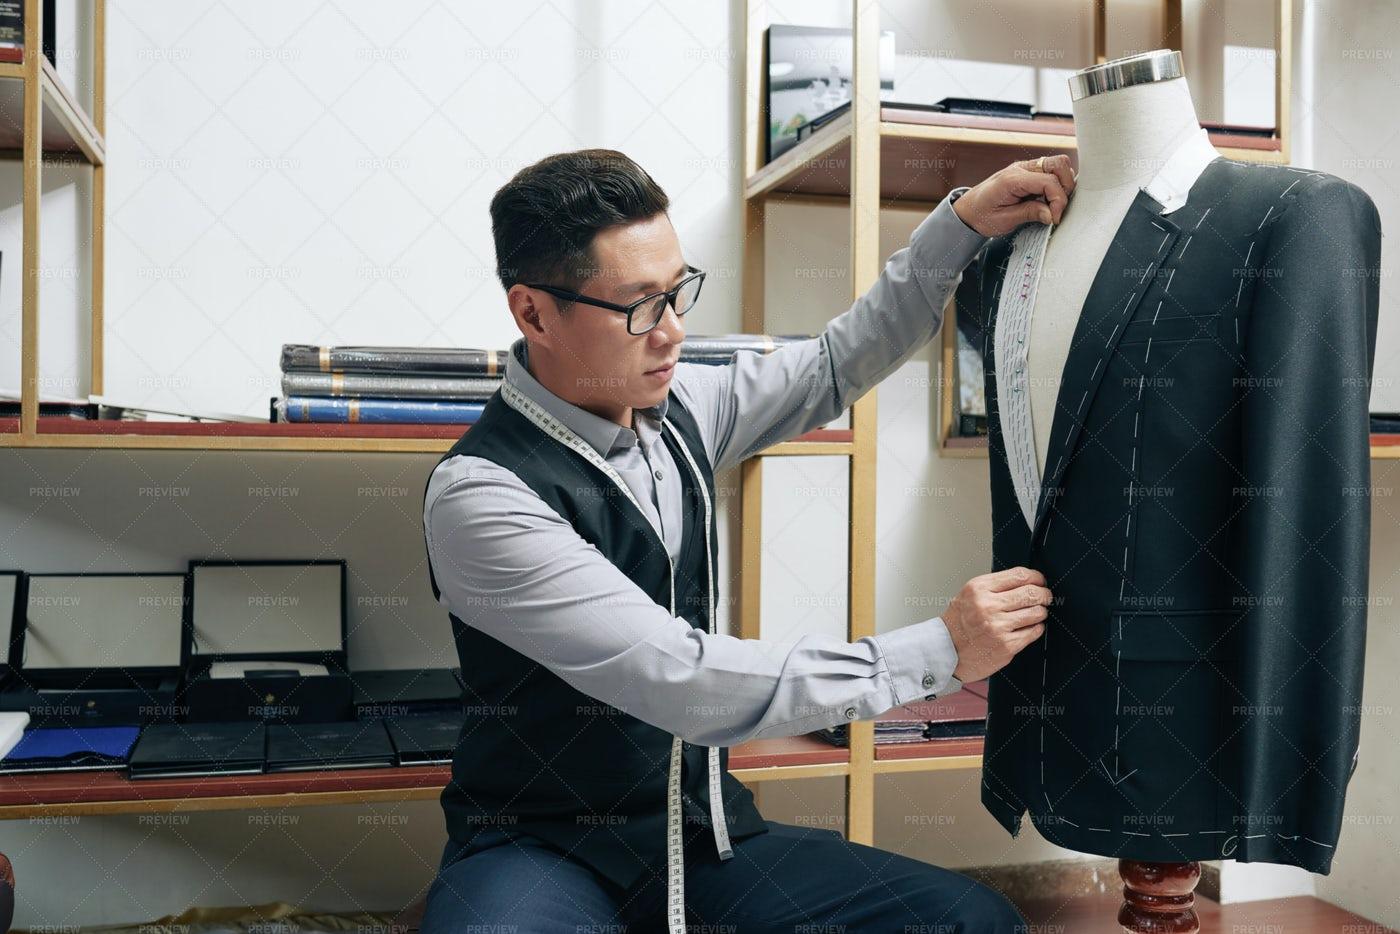 Tailor Measuring Suit Jacket: Stock Photos